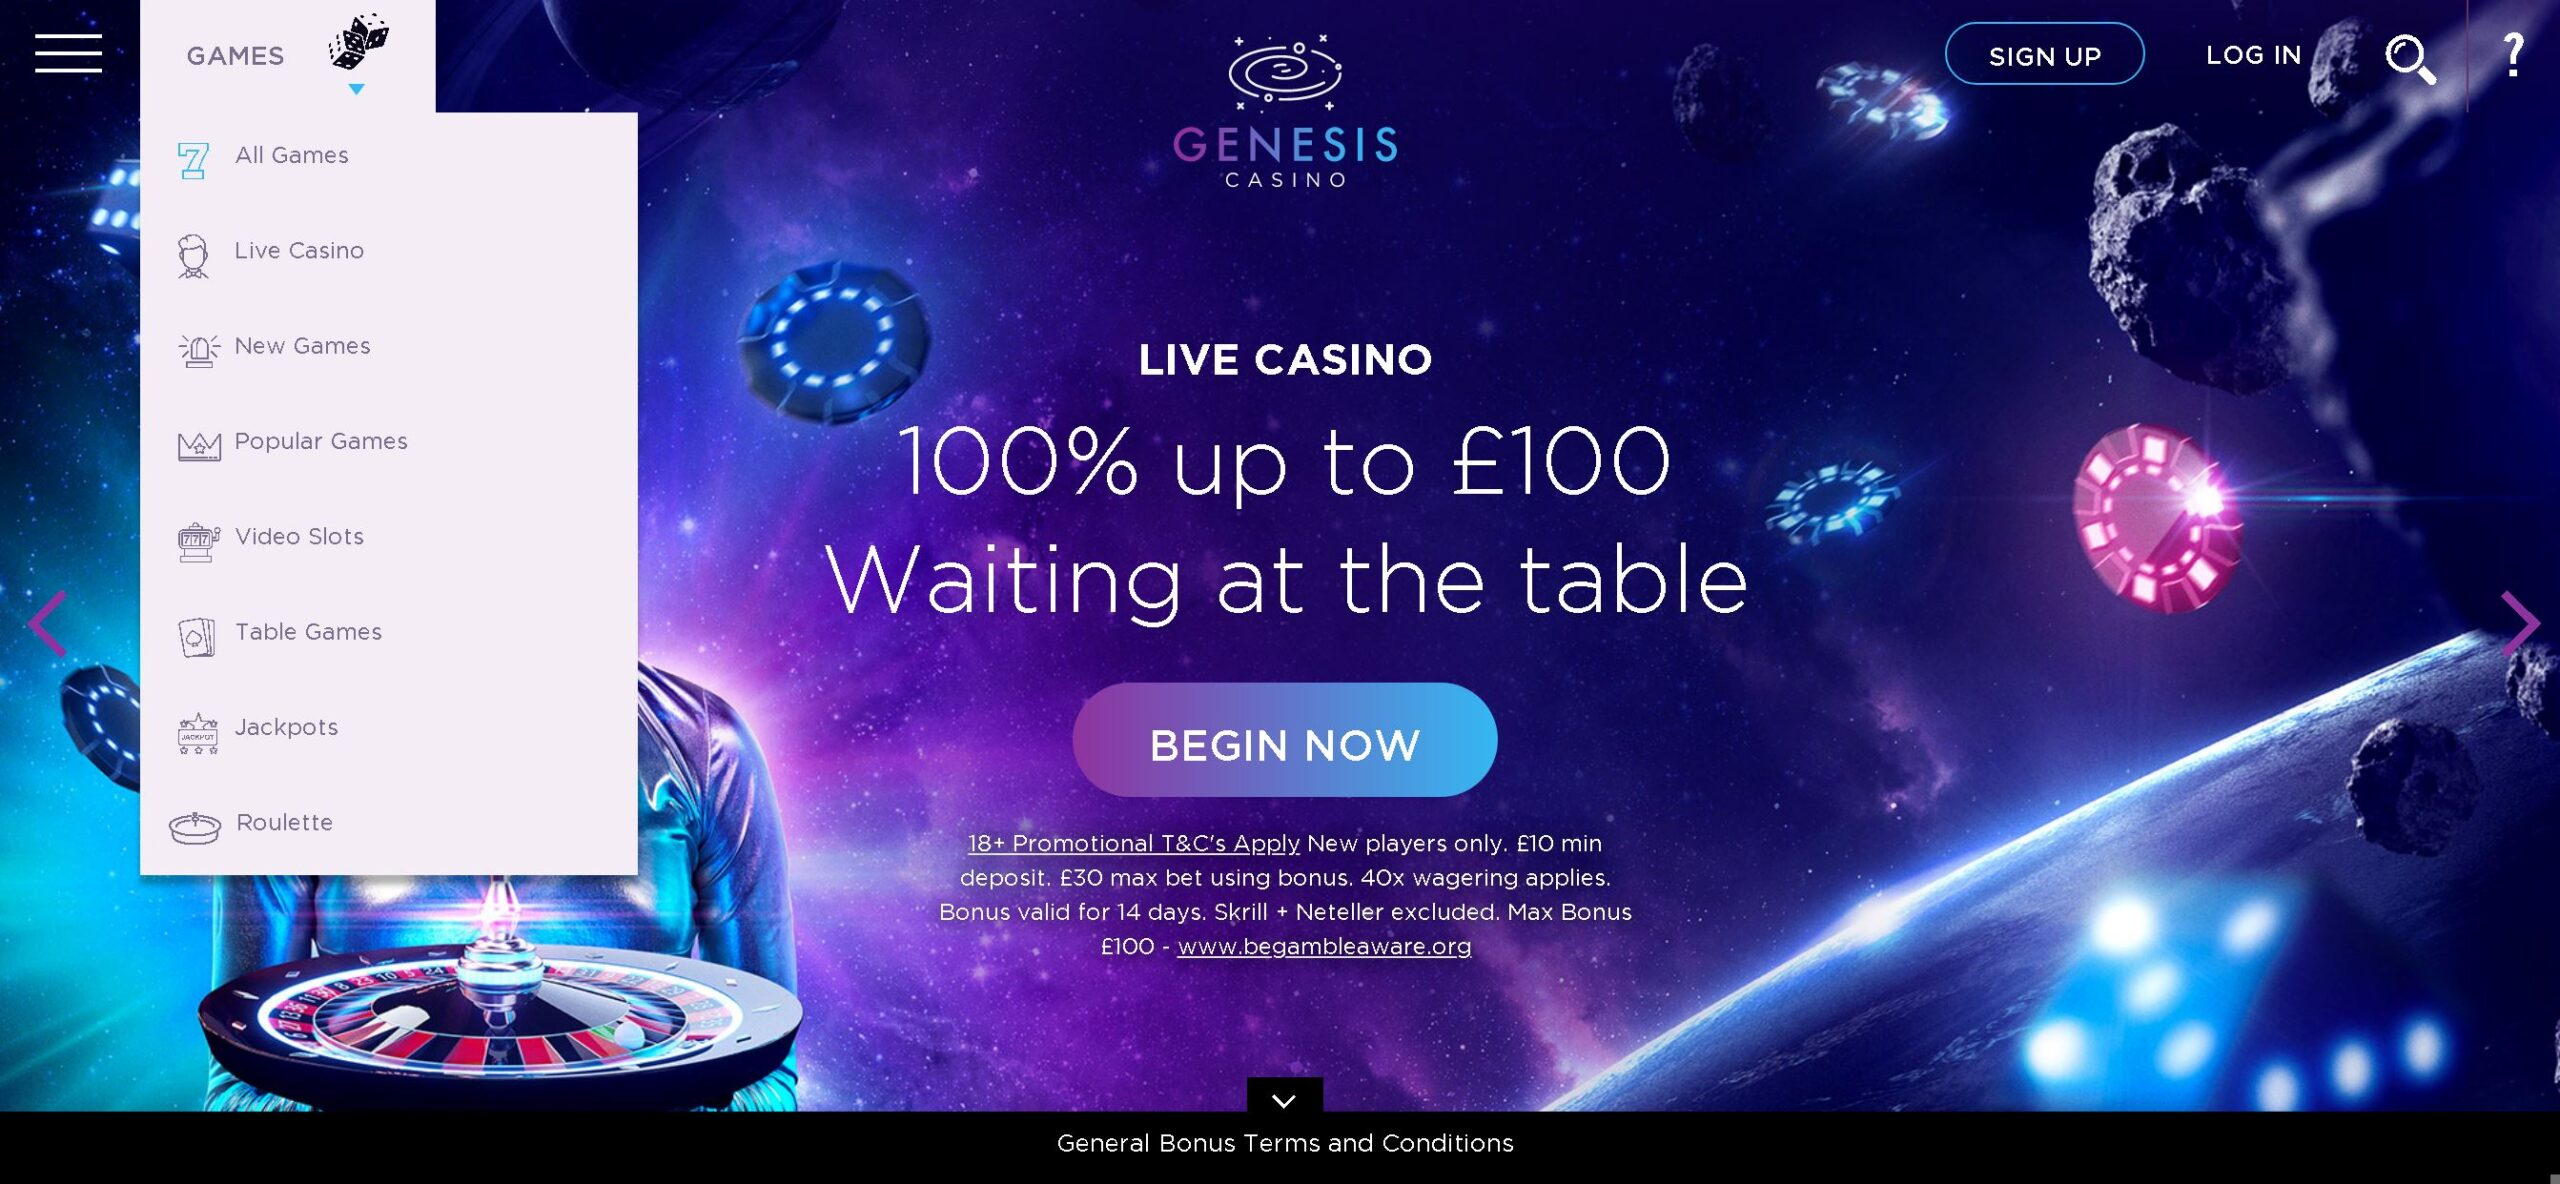 Genesis casino live casino sign-up offer